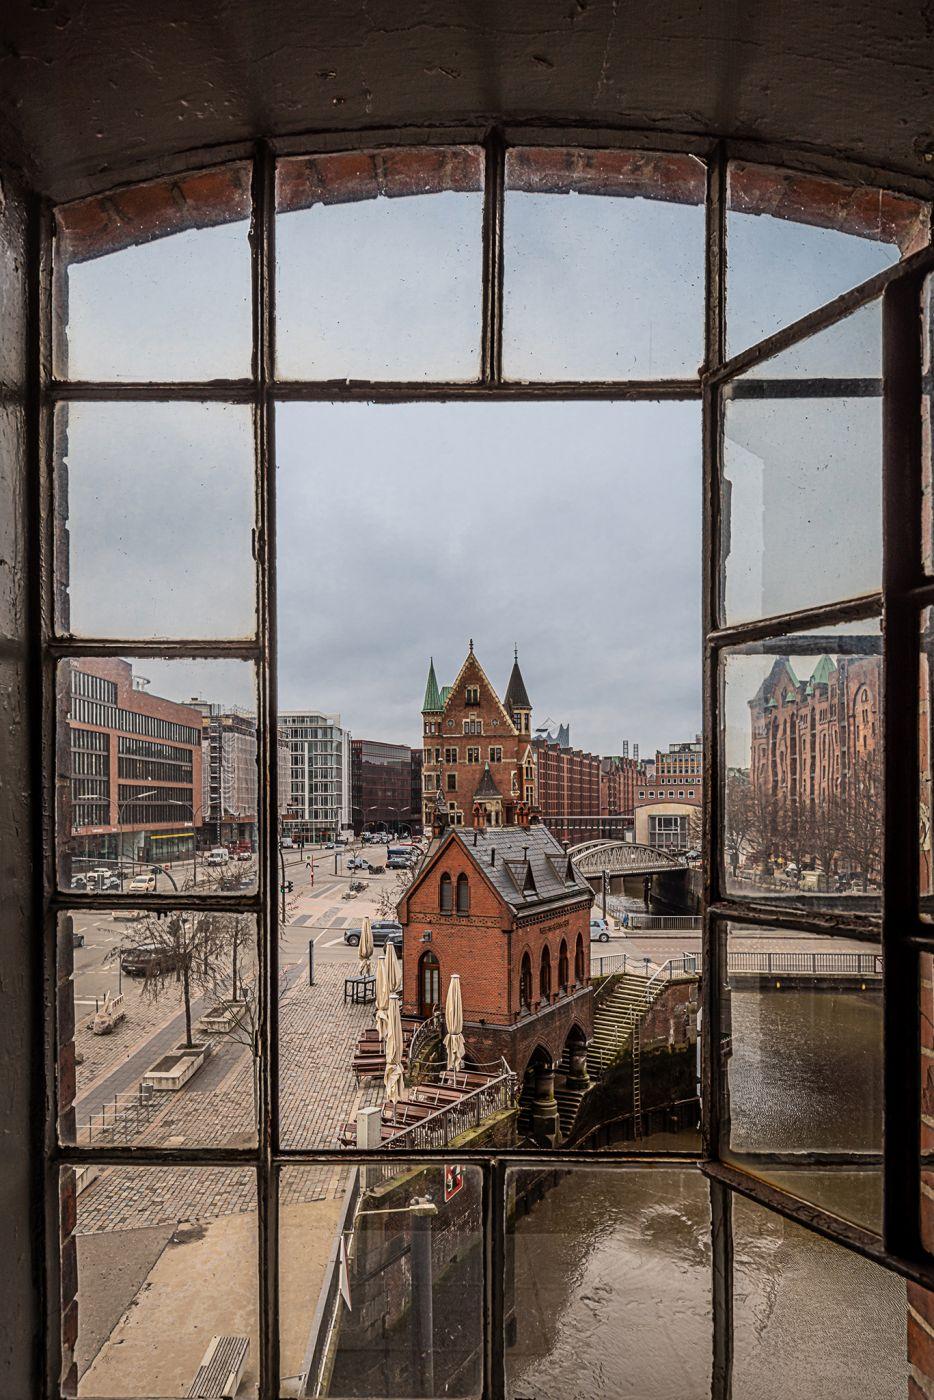 Speicherstadtfenster, Germany